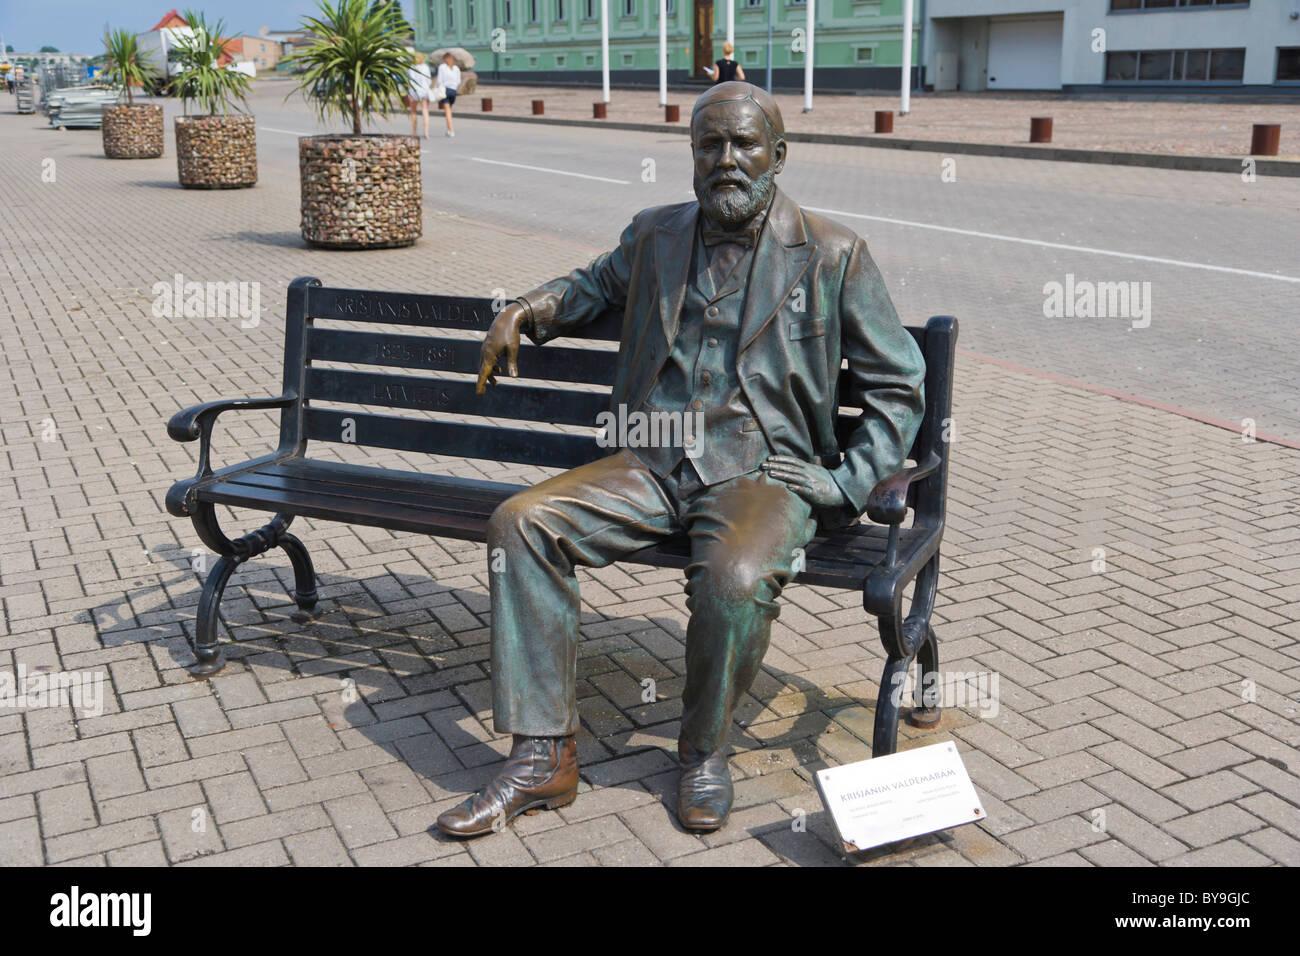 Monument to the Founder of the Latvian Seafaring, Krisjanis Valdemars, sculpture, Spikeru piekraste, Ostas Street - Stock Image